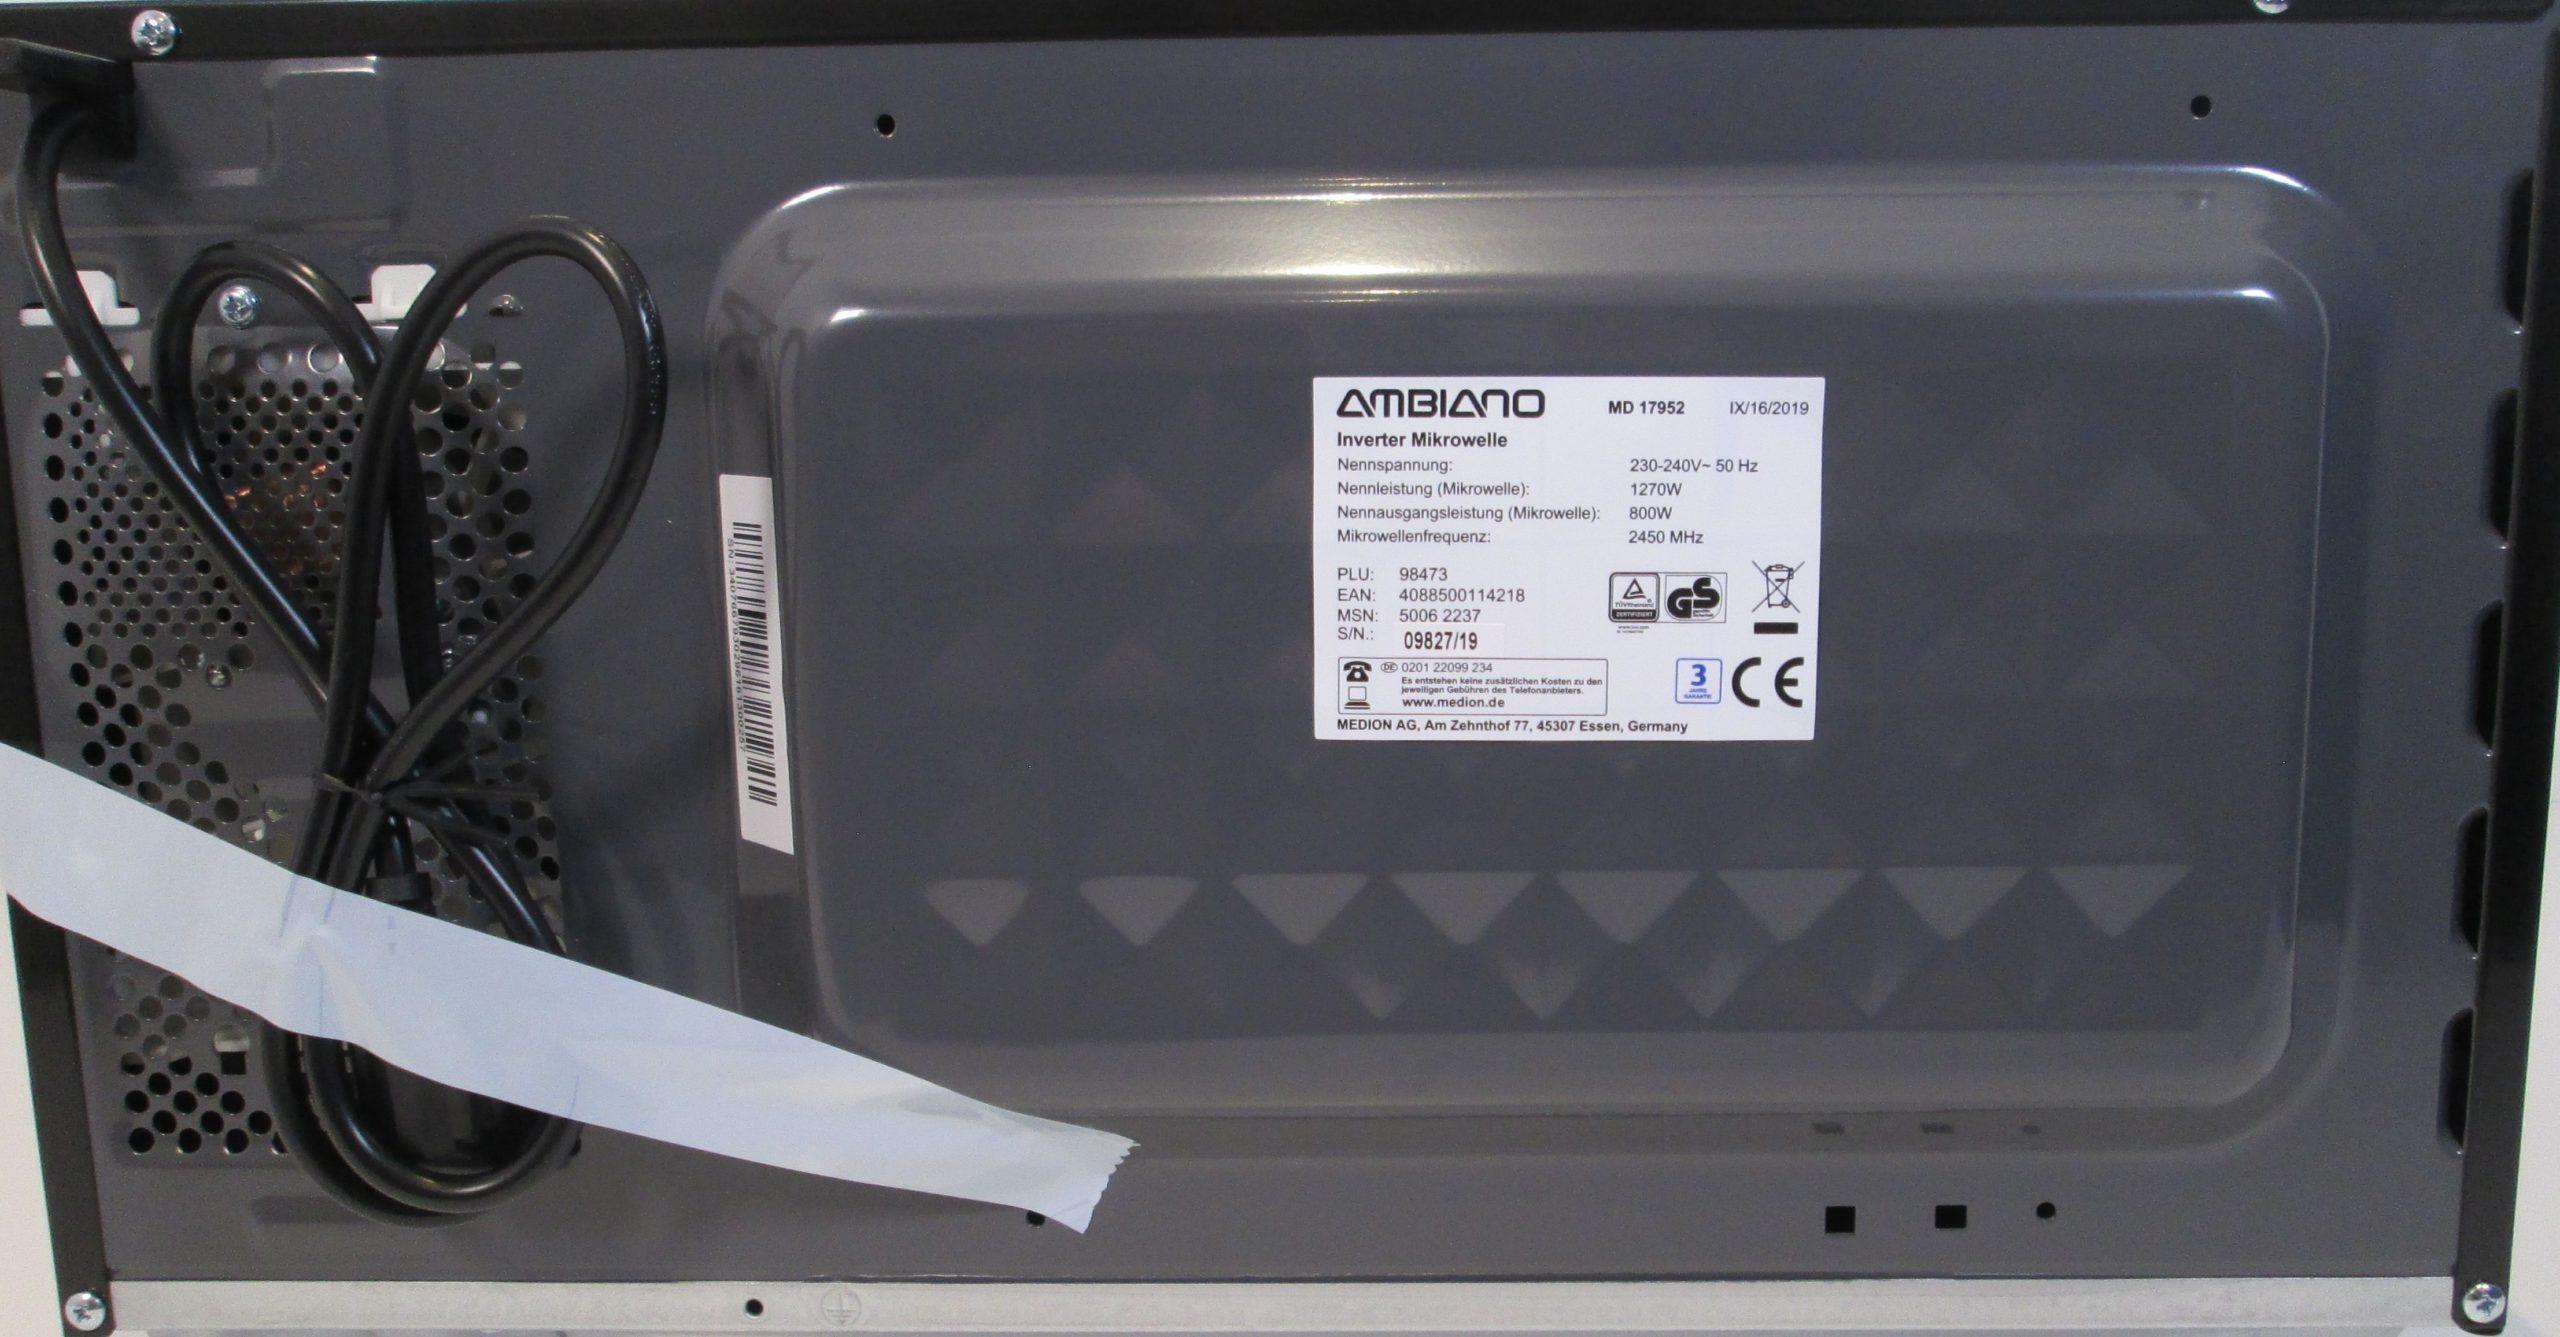 ambiano inverter mikrowelle